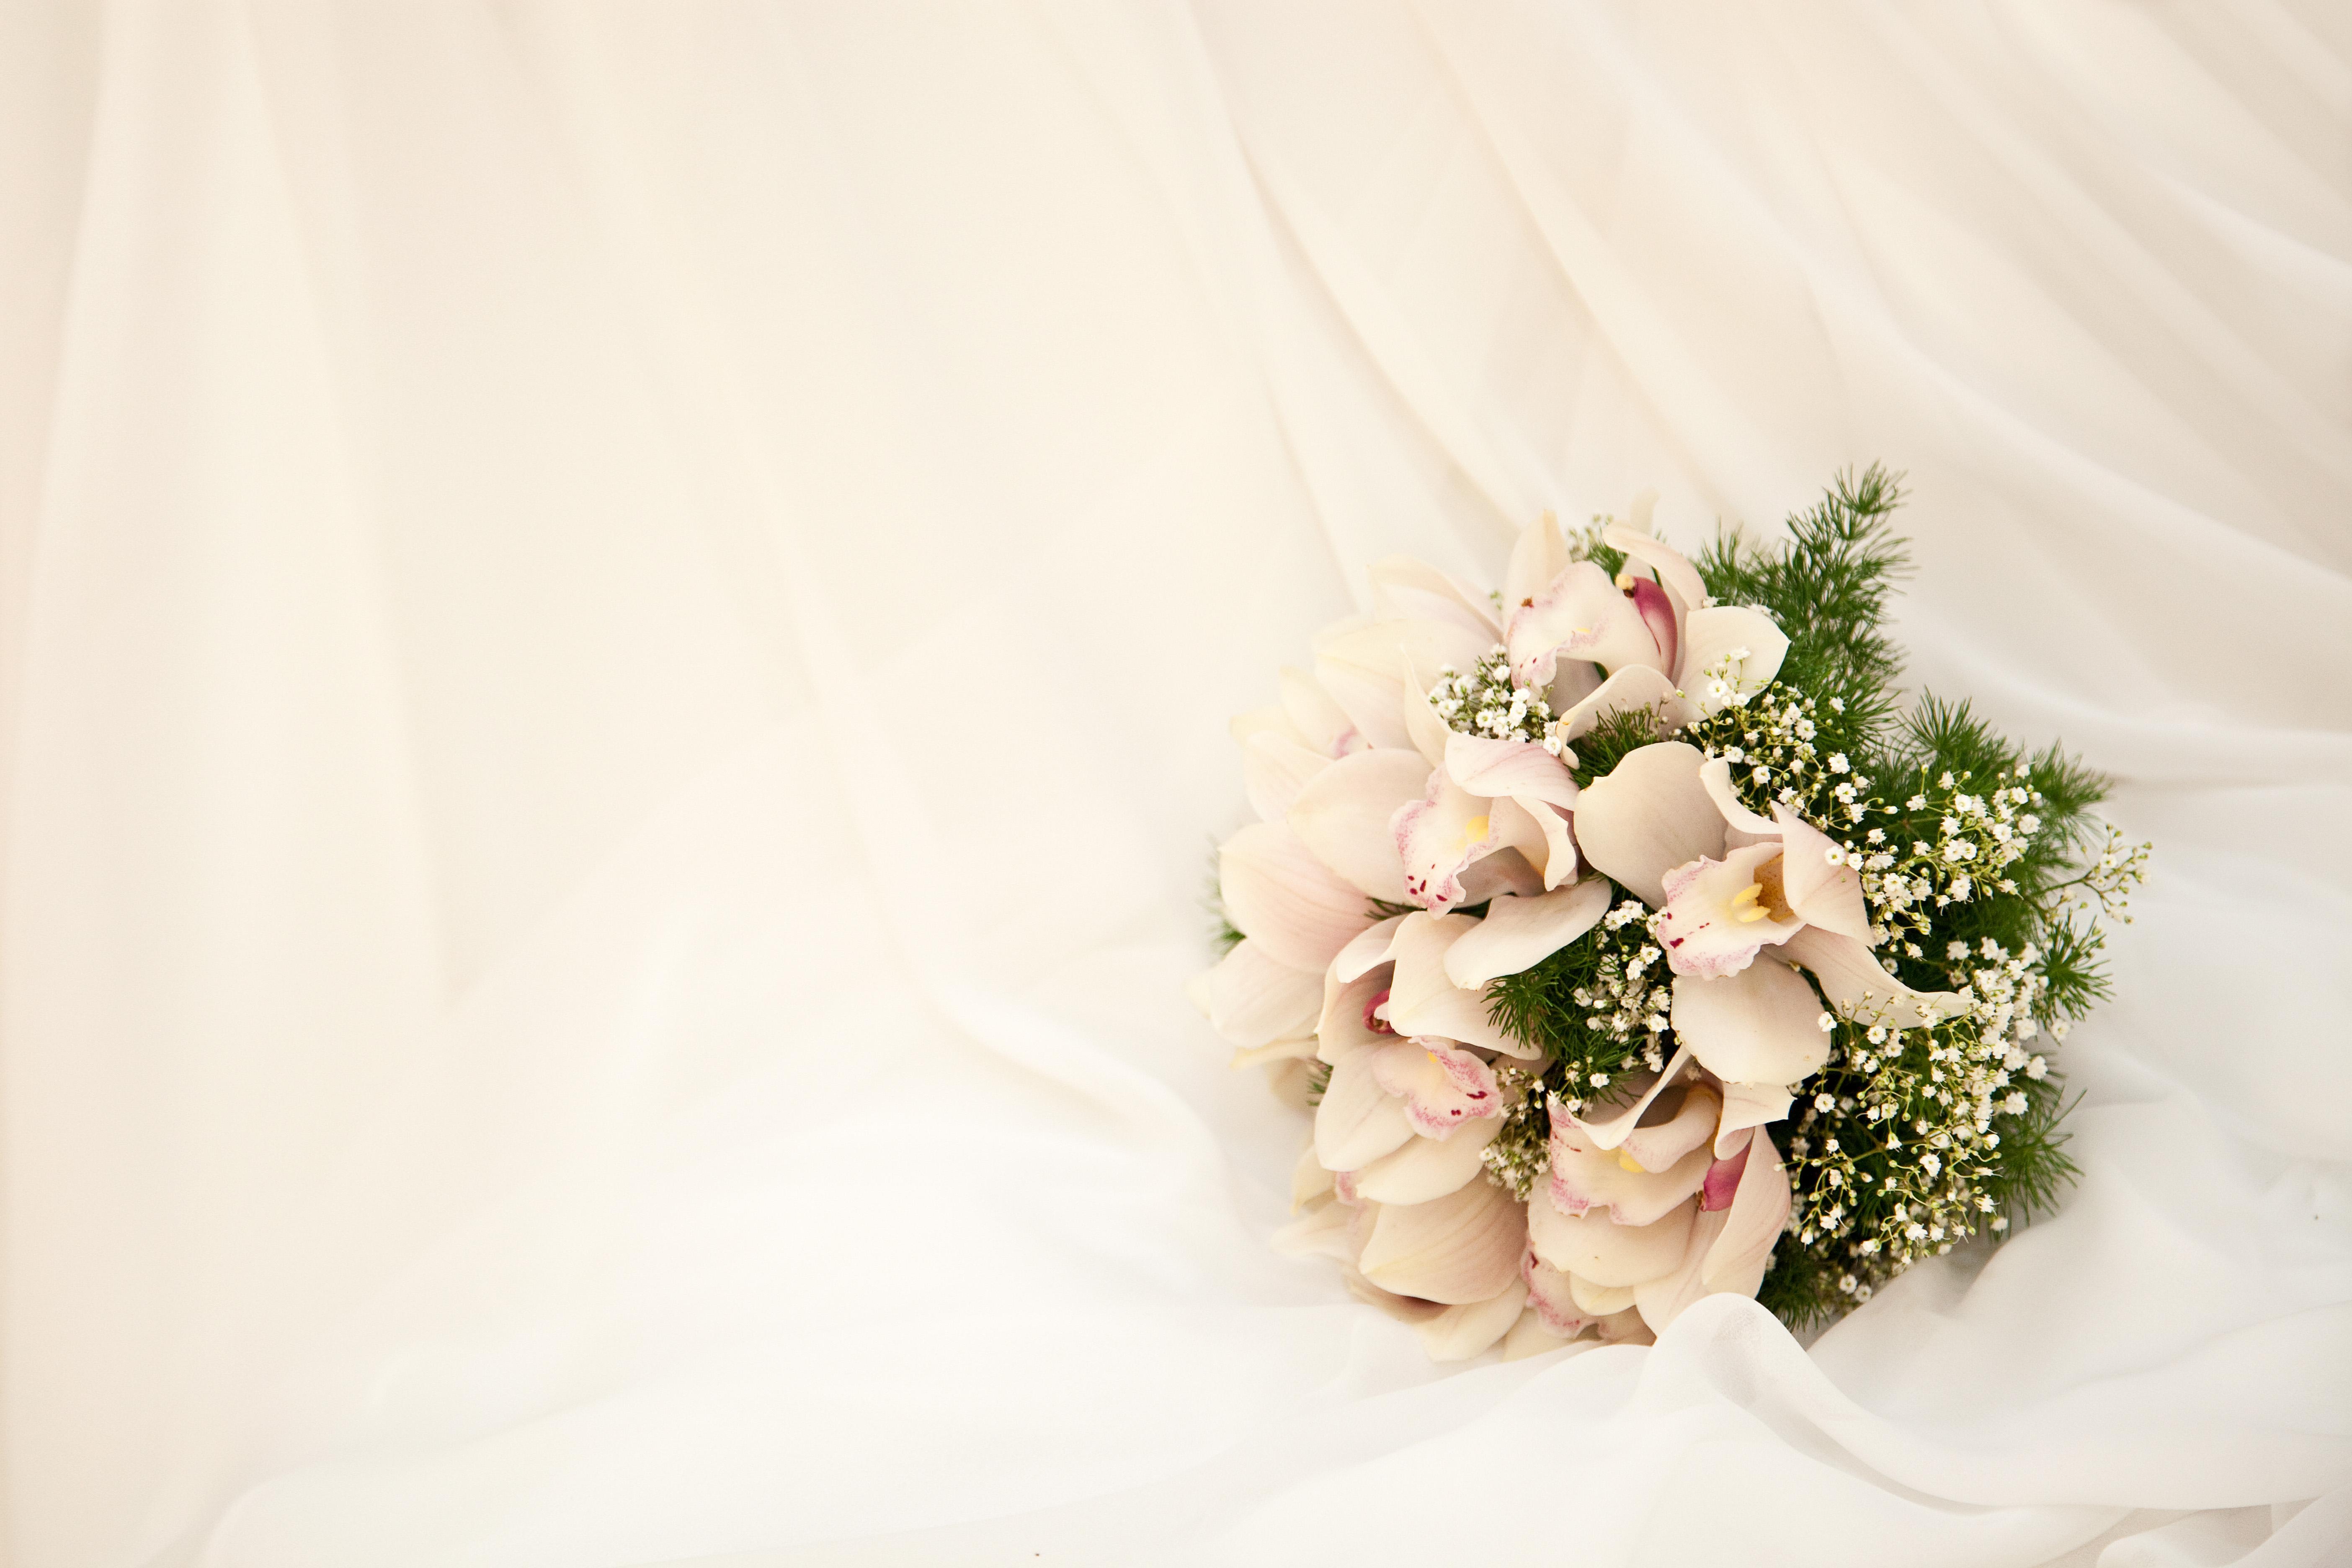 wedding flowers bouquet photo - 1